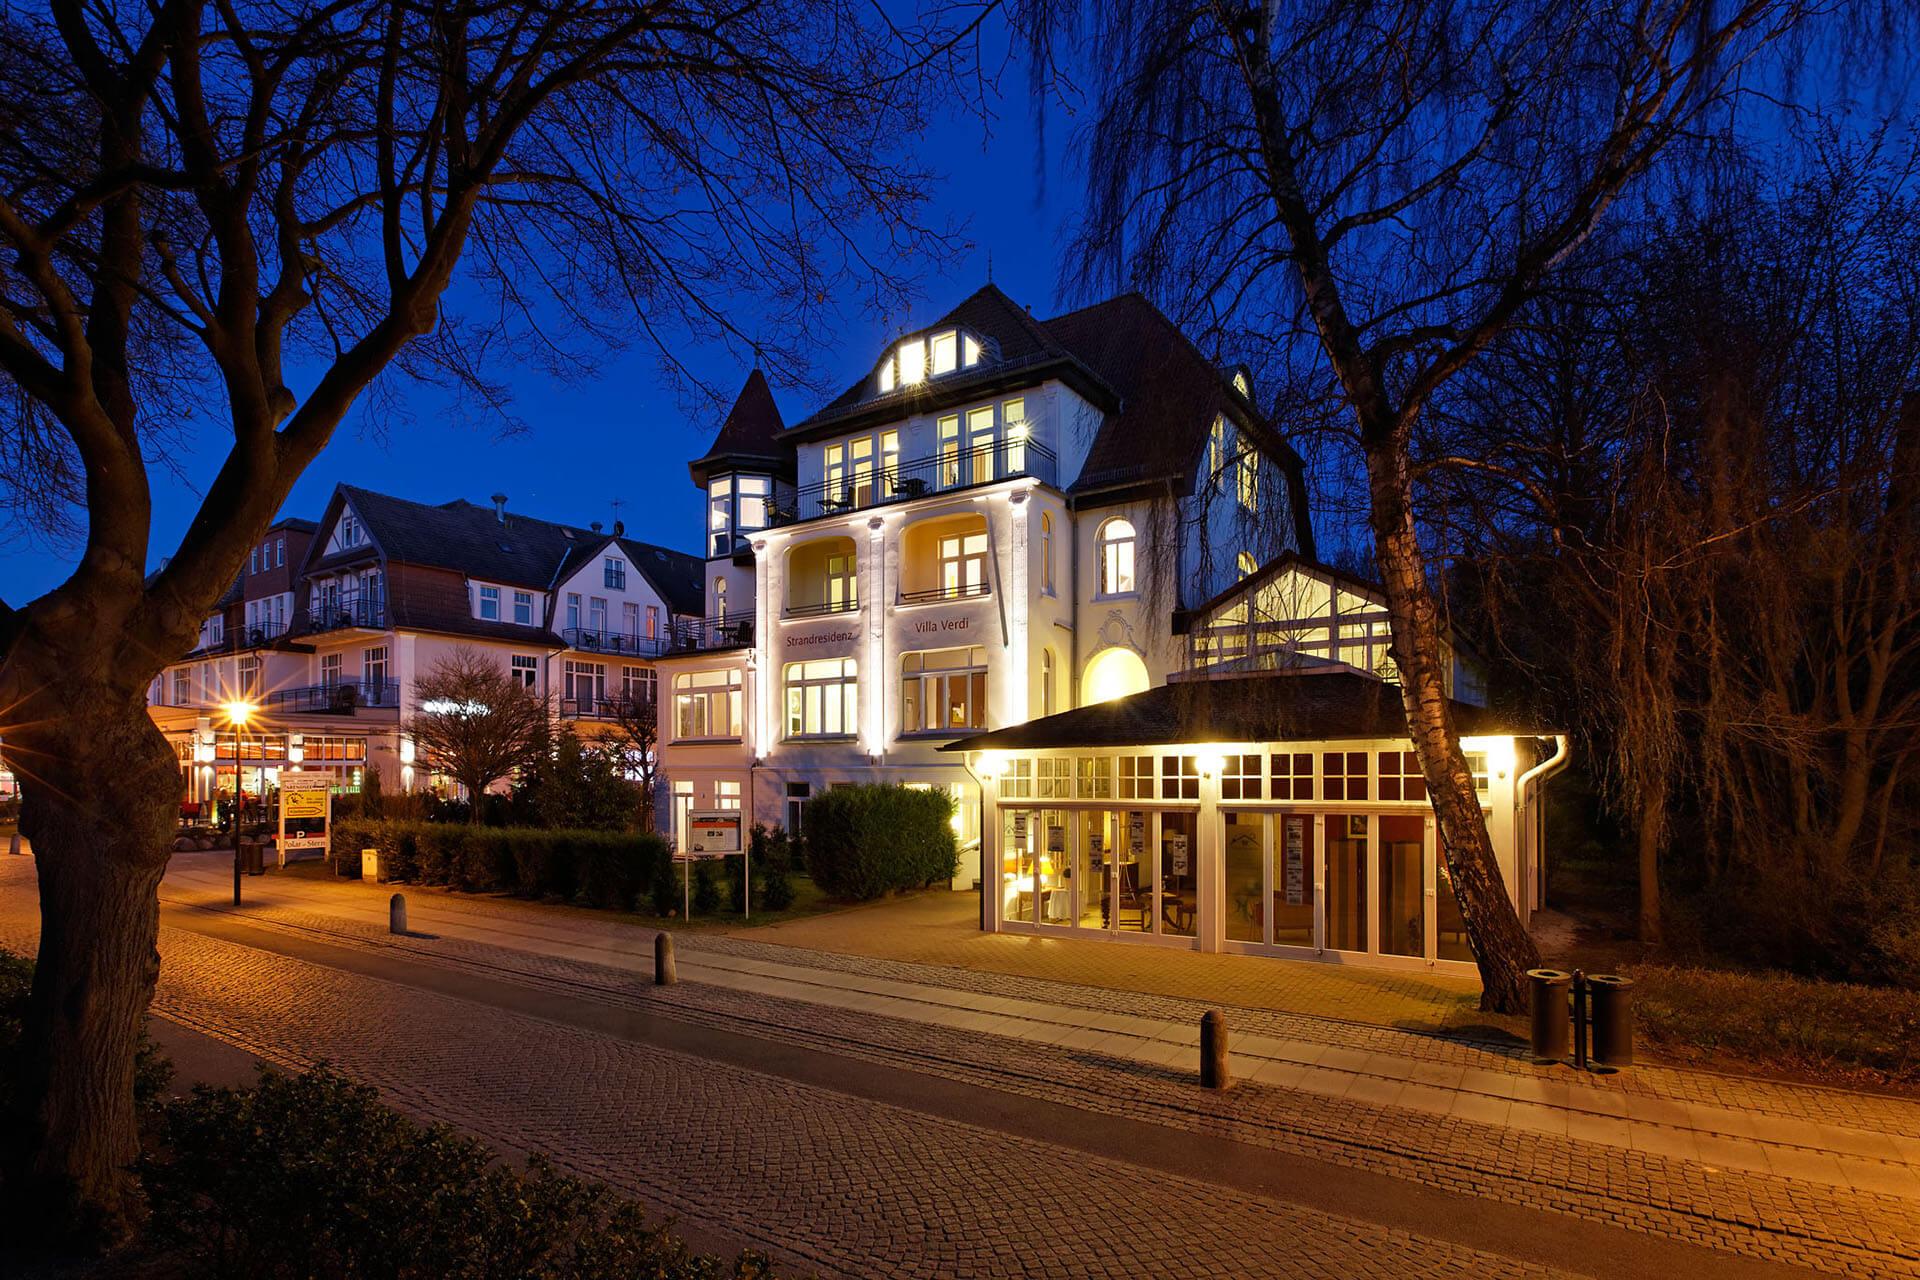 Hotel Villa Verdi In K Ef Bf Bdhlungsborn